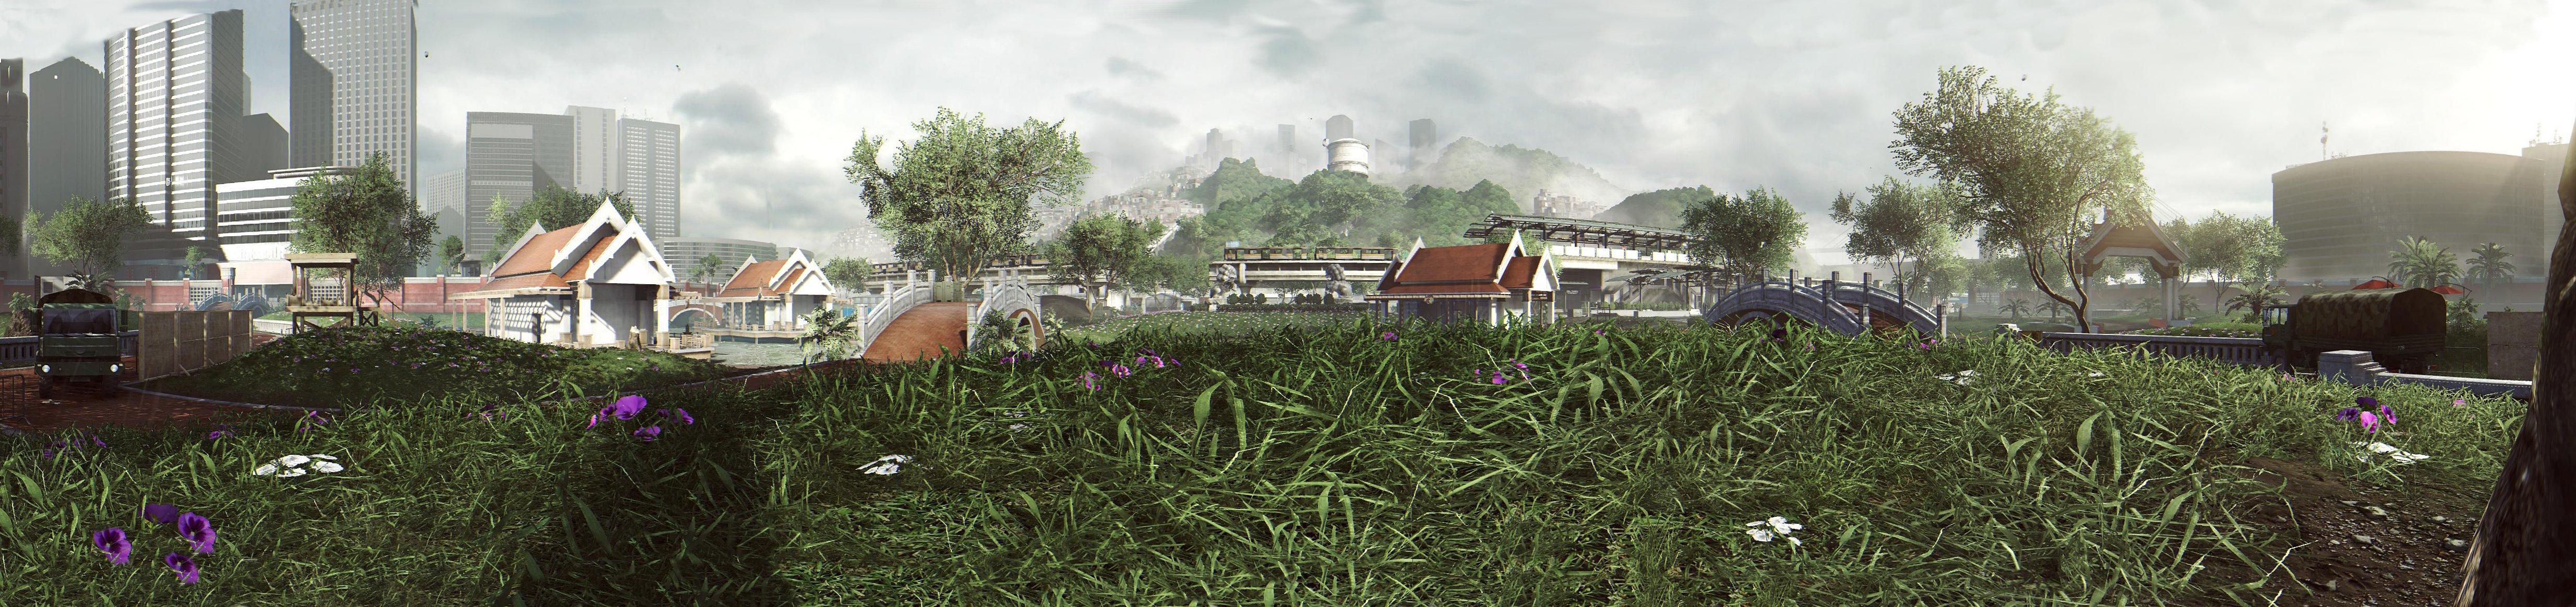 Battlefield 4 Dragon's Teeth в широком формате (панорама) - Изображение 3